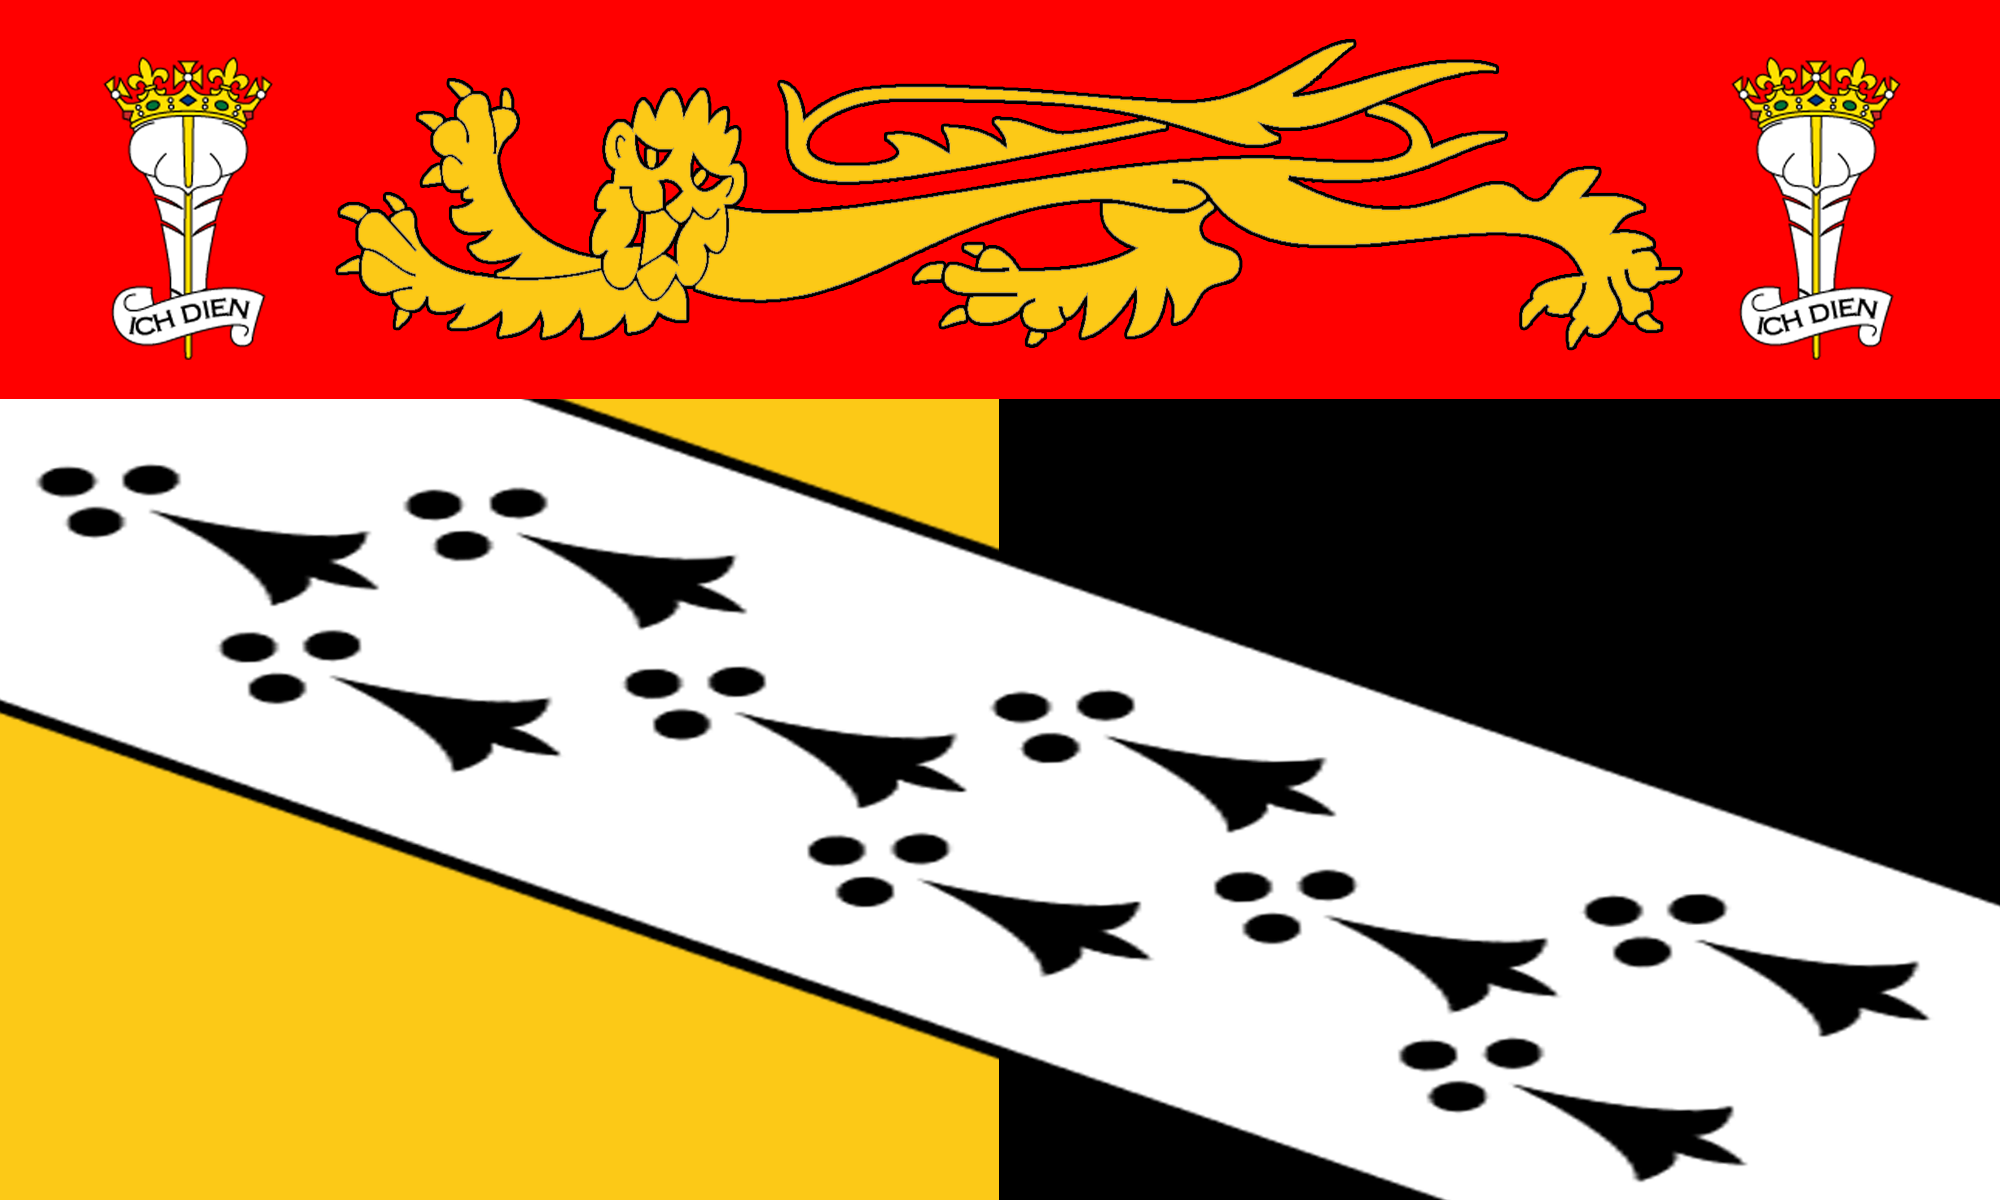 Norfolk, Land, Emblem, Logo, Symbol - Wallpaper HD - Prof.-falken.com